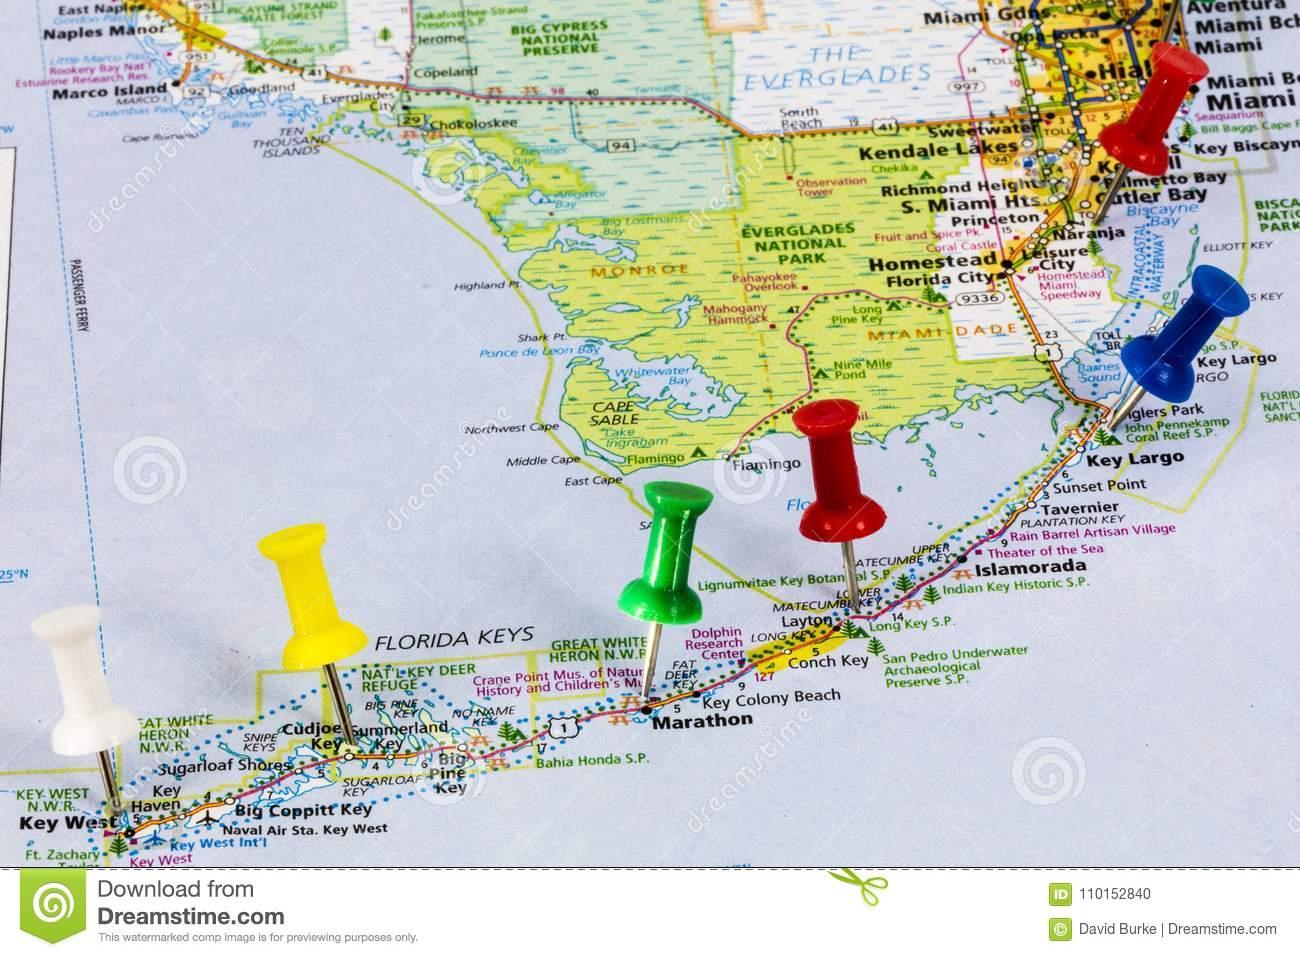 Florida Keys Miami Map Editorial Image. Image Of Miami - 110152840 - Florida Travel Guide Map